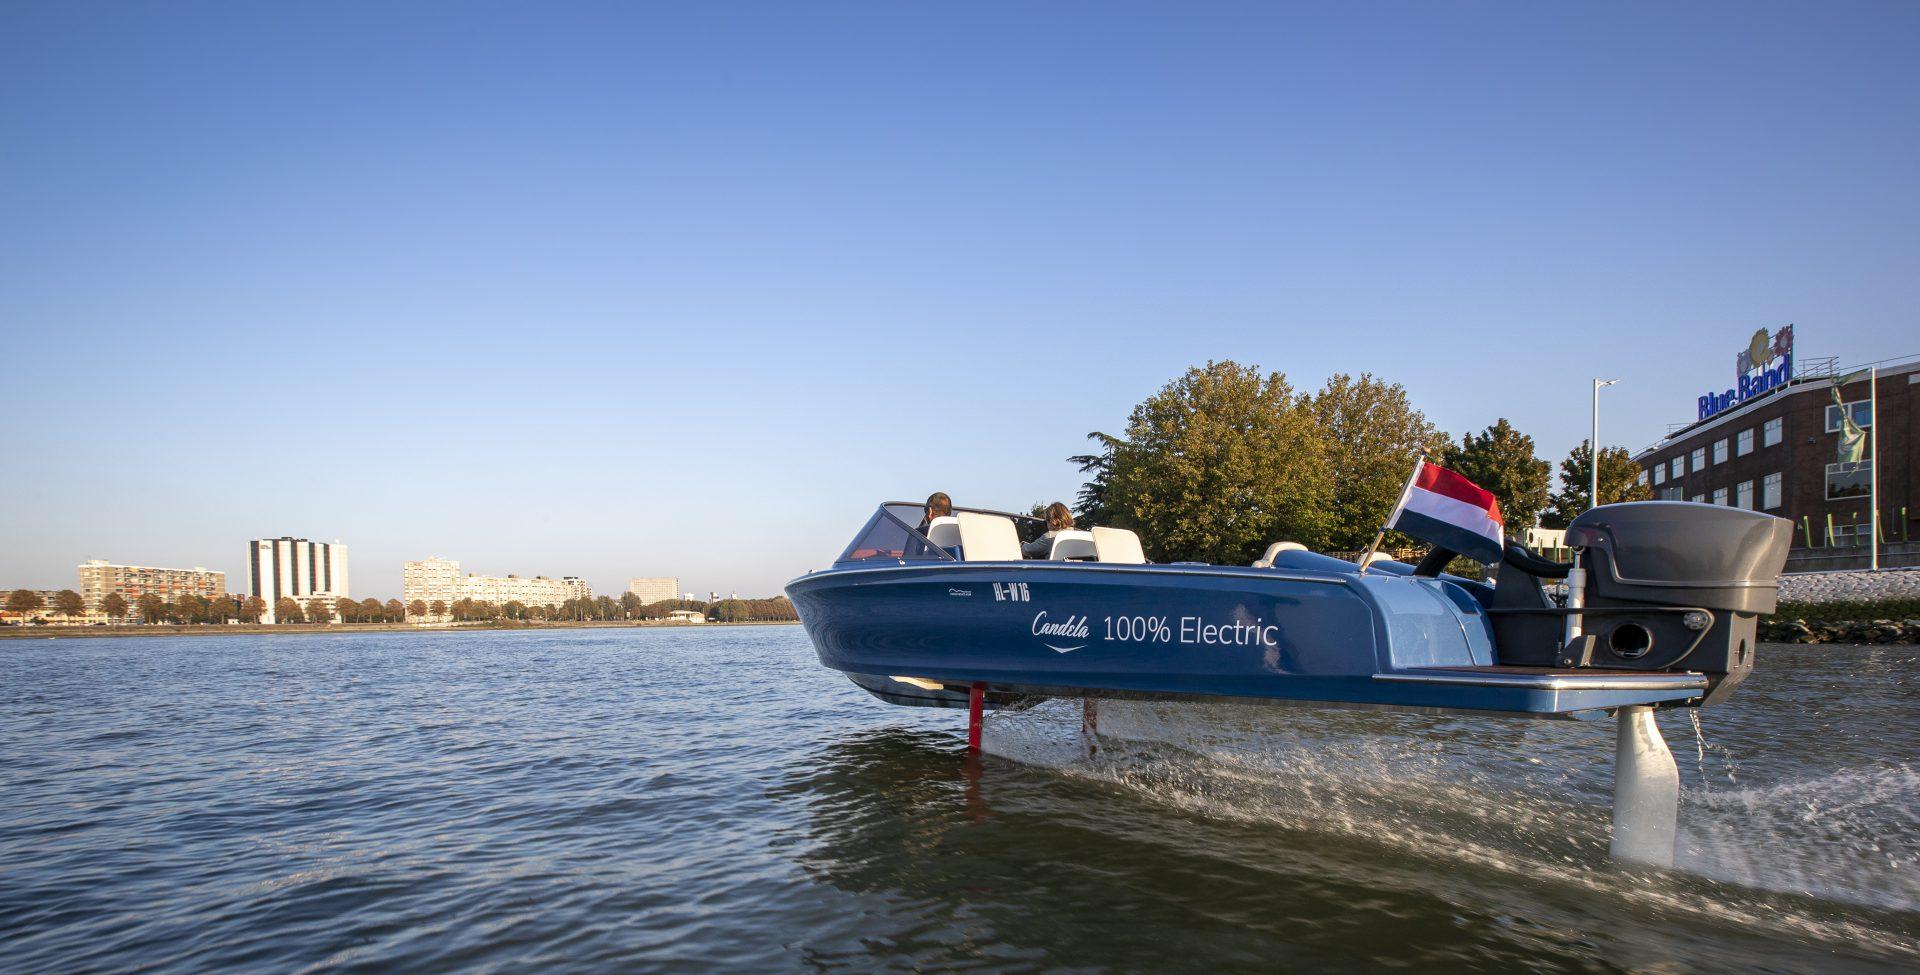 's Werelds eerste volledig elektrische hydrofoil speedboot komende week in Nederland